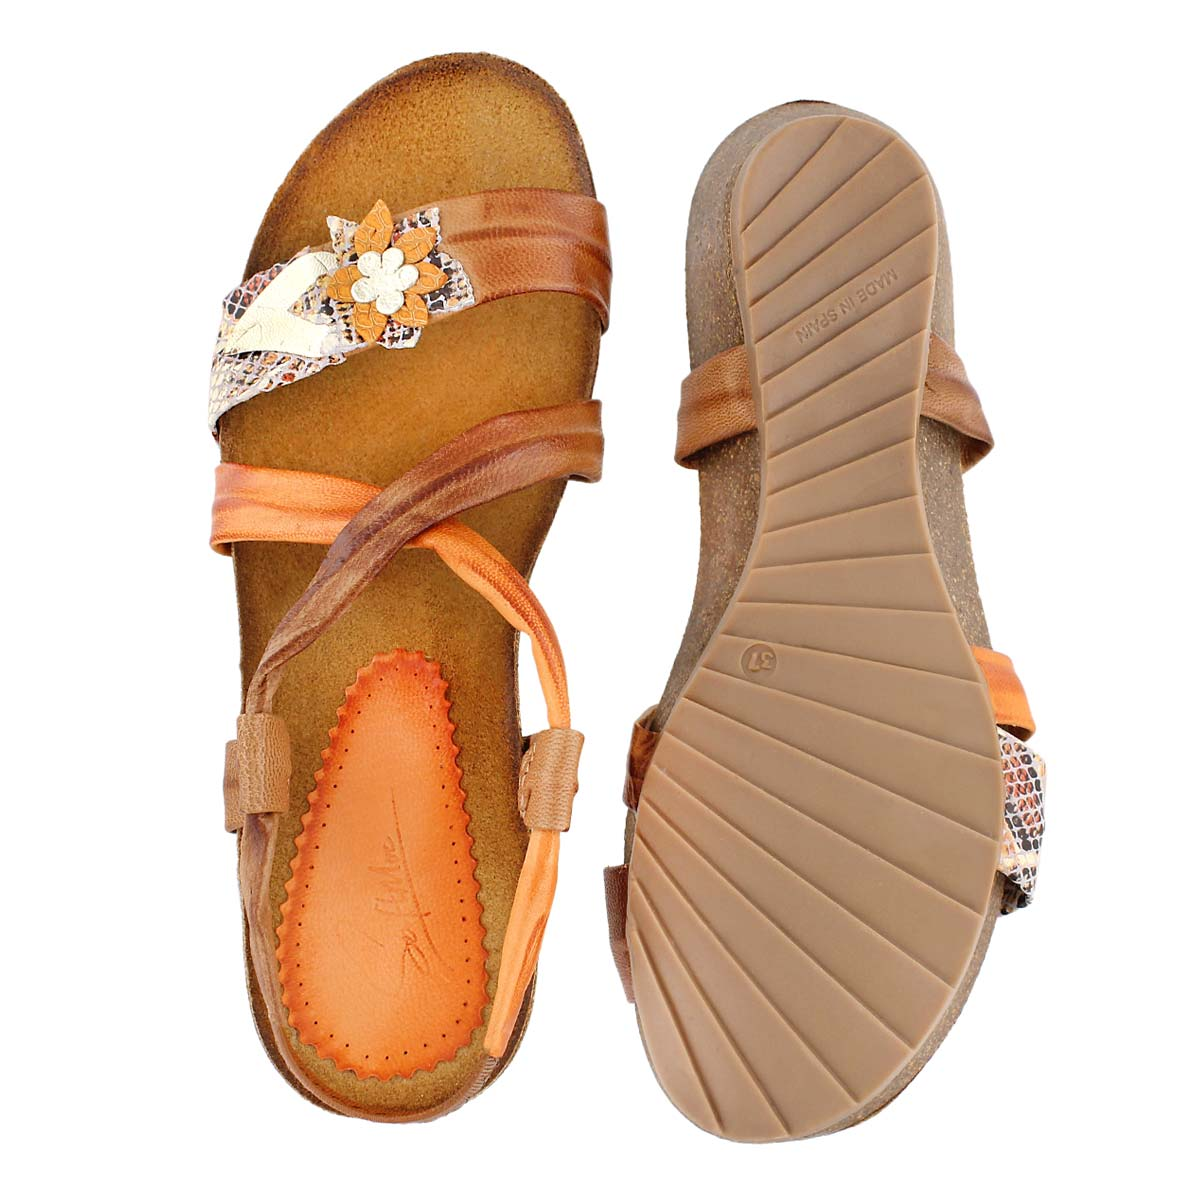 Sandale compensée Madison, havane, femme